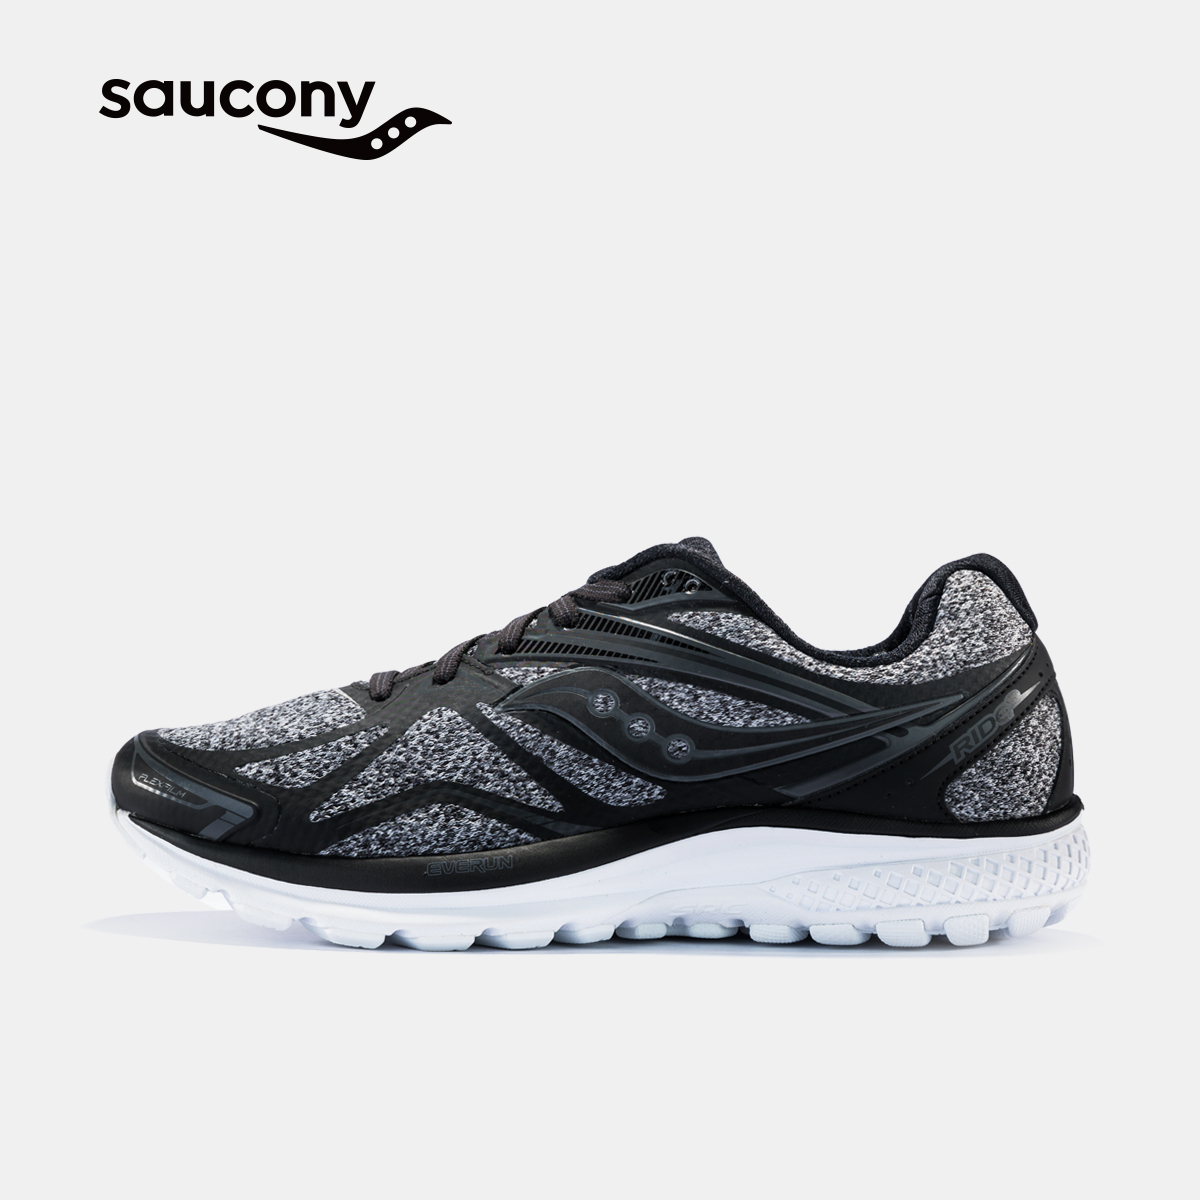 Saucony圣康尼 RIDE 9 LR 中性缓震跑鞋运动鞋男子跑步鞋 S20364